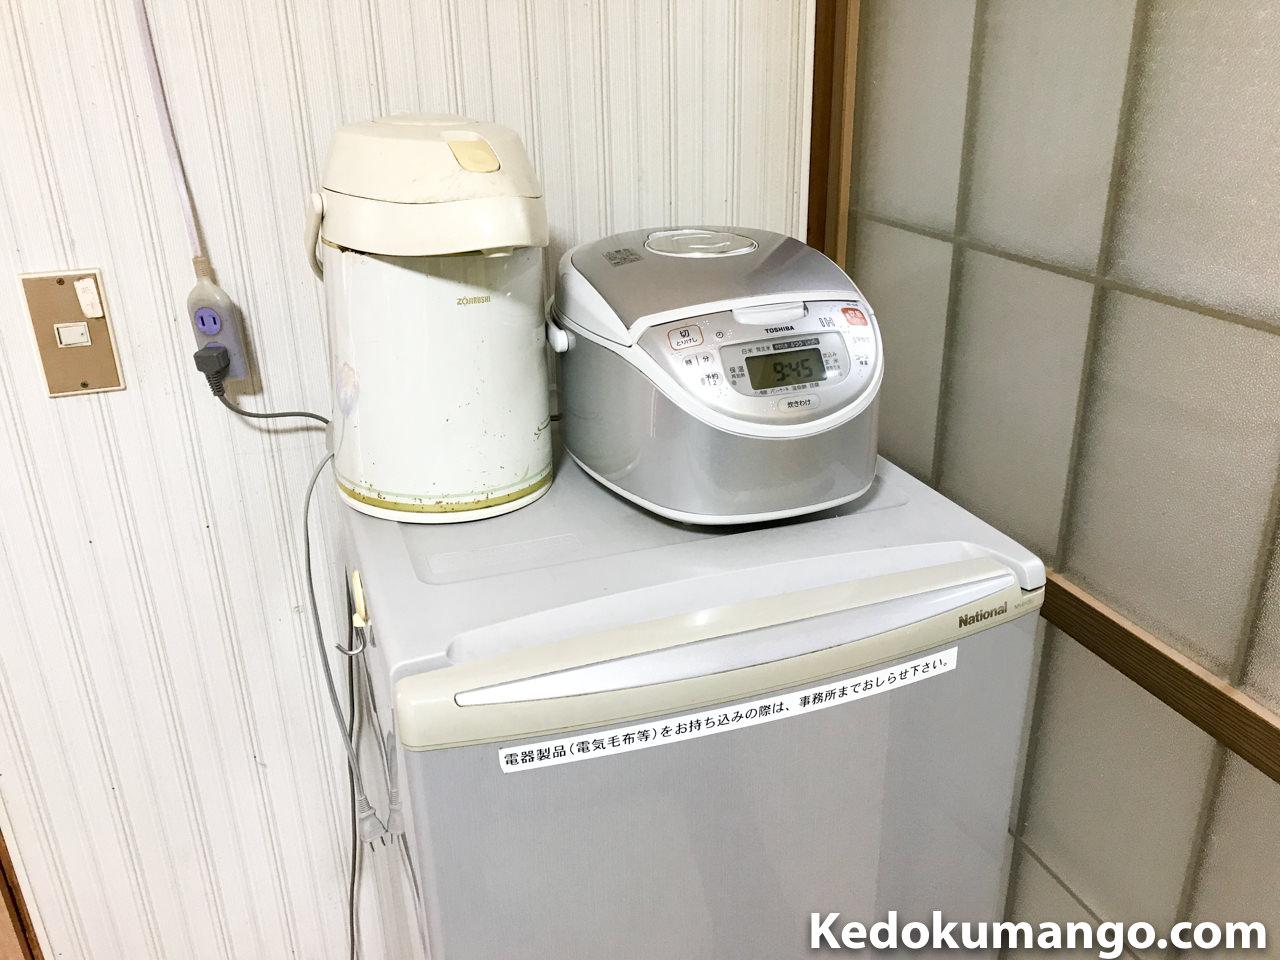 冷蔵庫と炊飯器